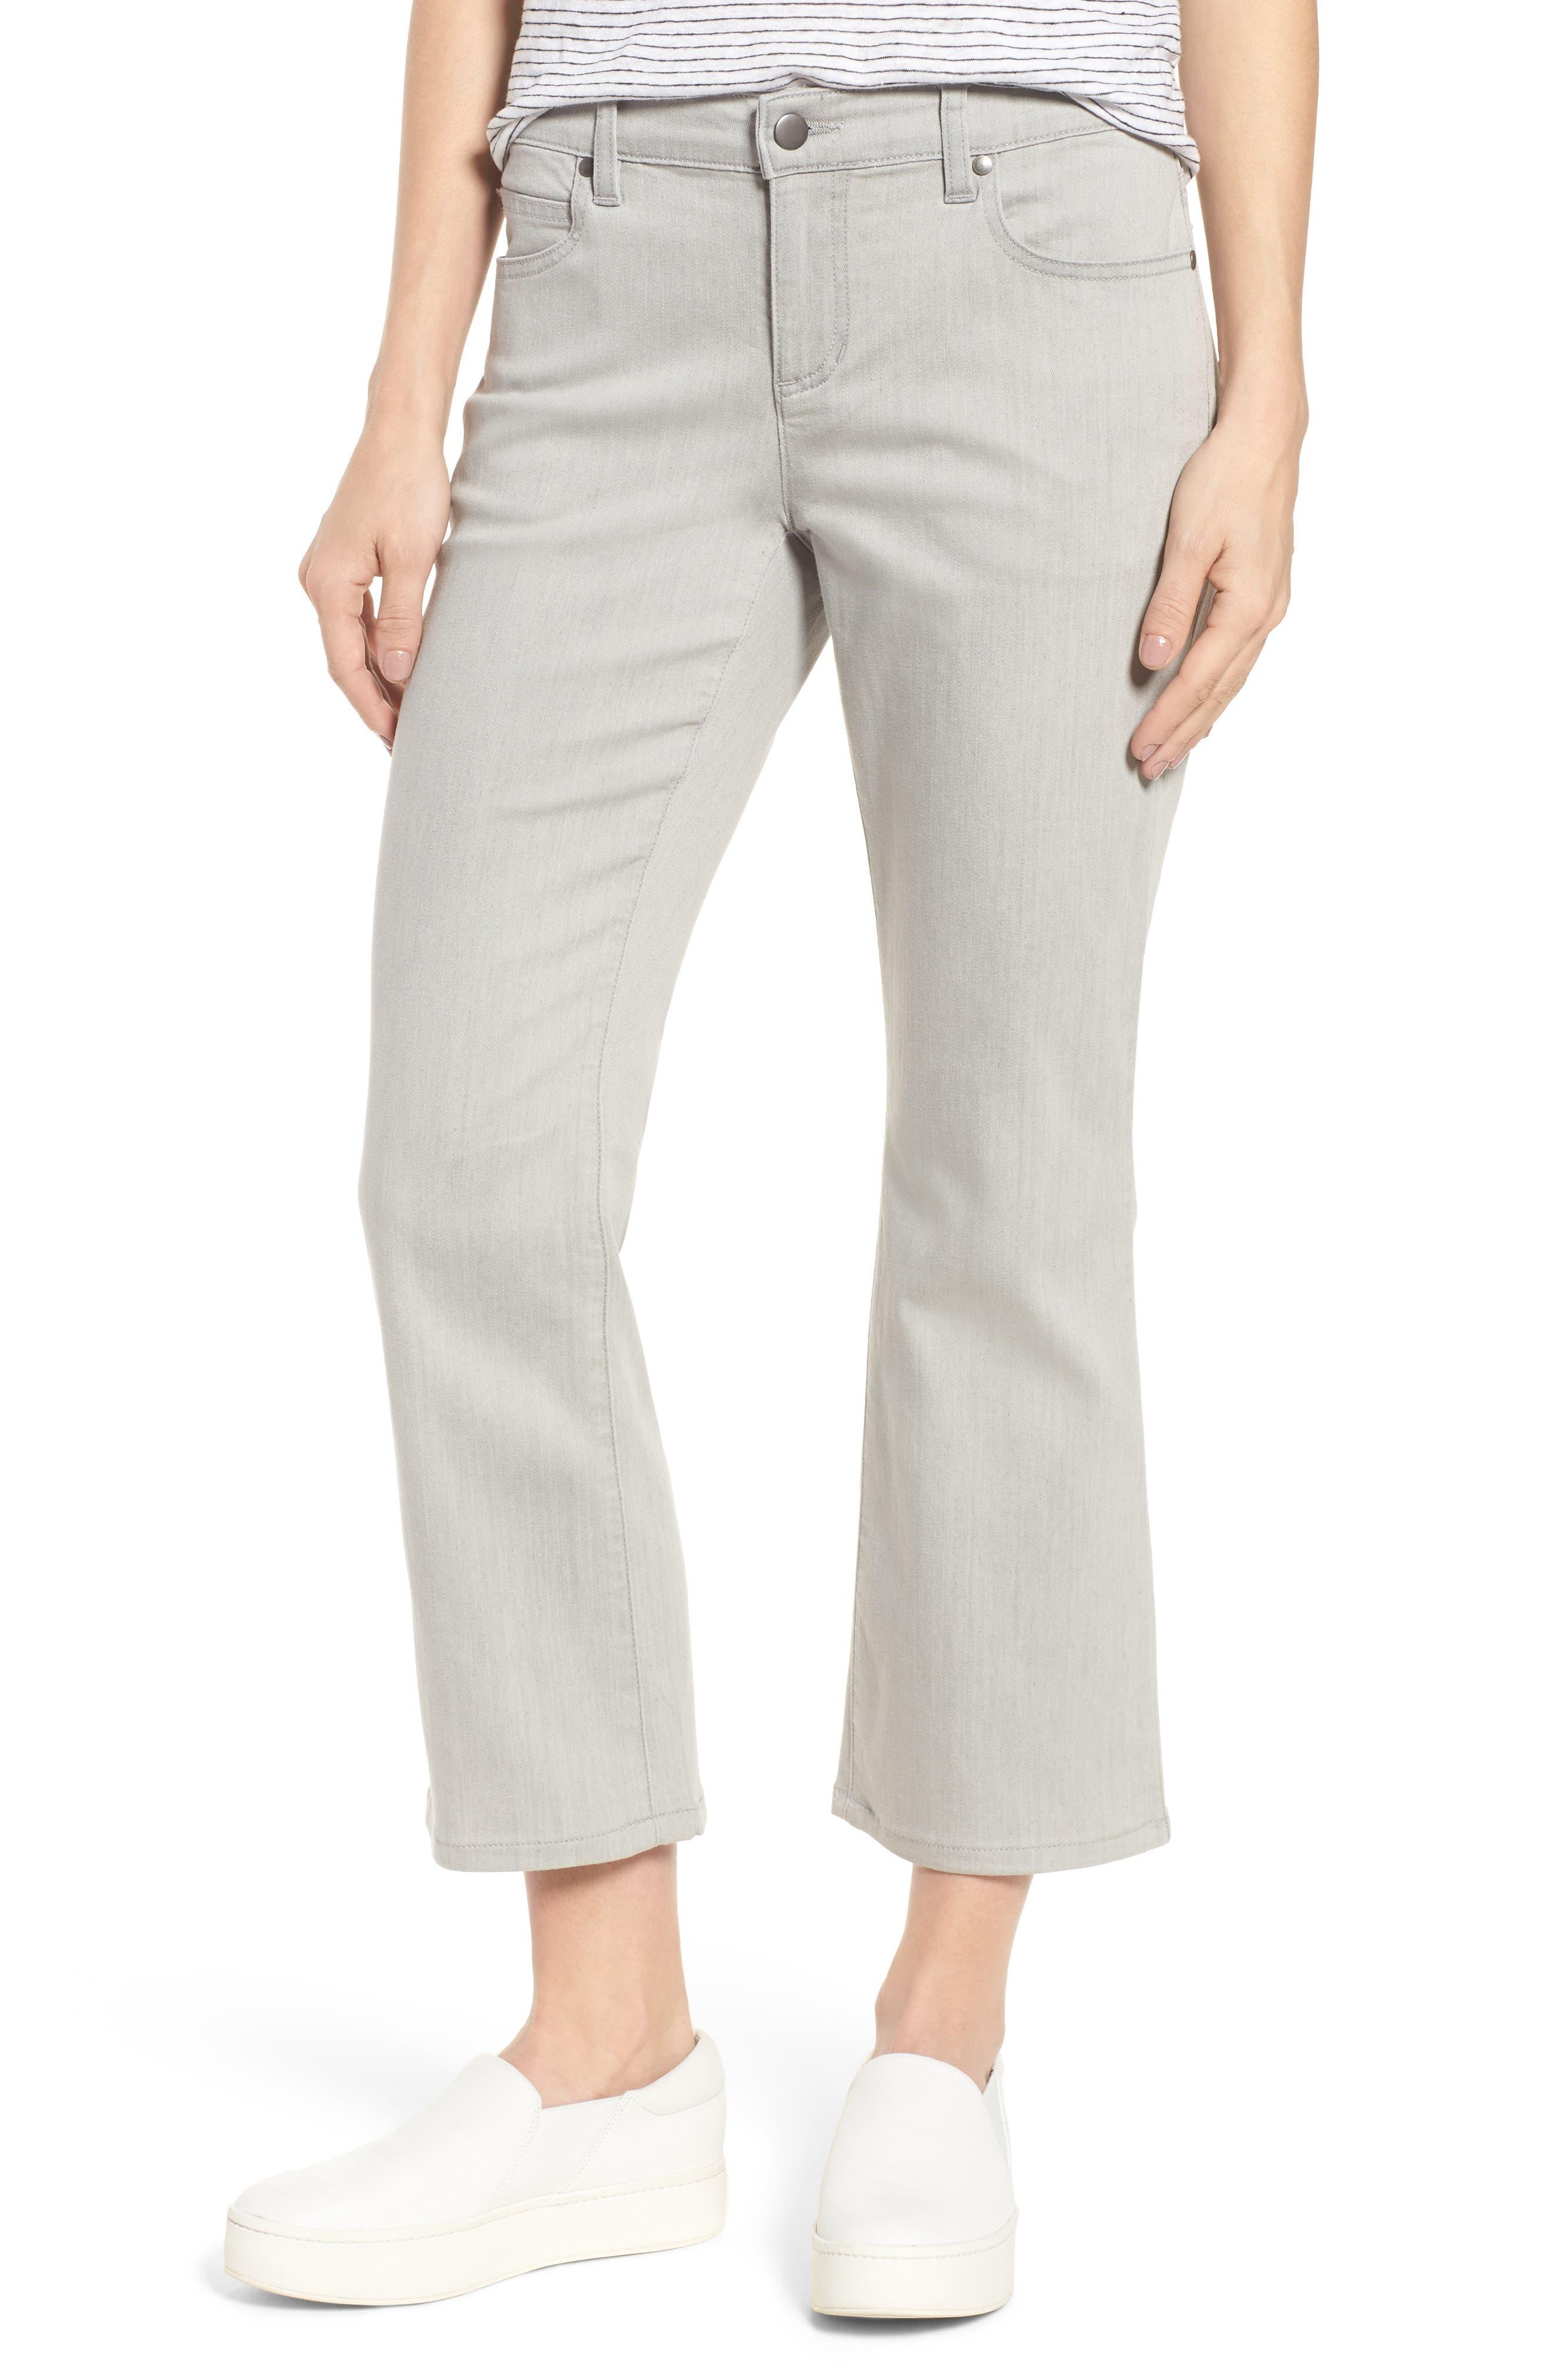 Eileen Fisher Organic Cotton Blend Crop Flare Jeans (Regular & Petite)